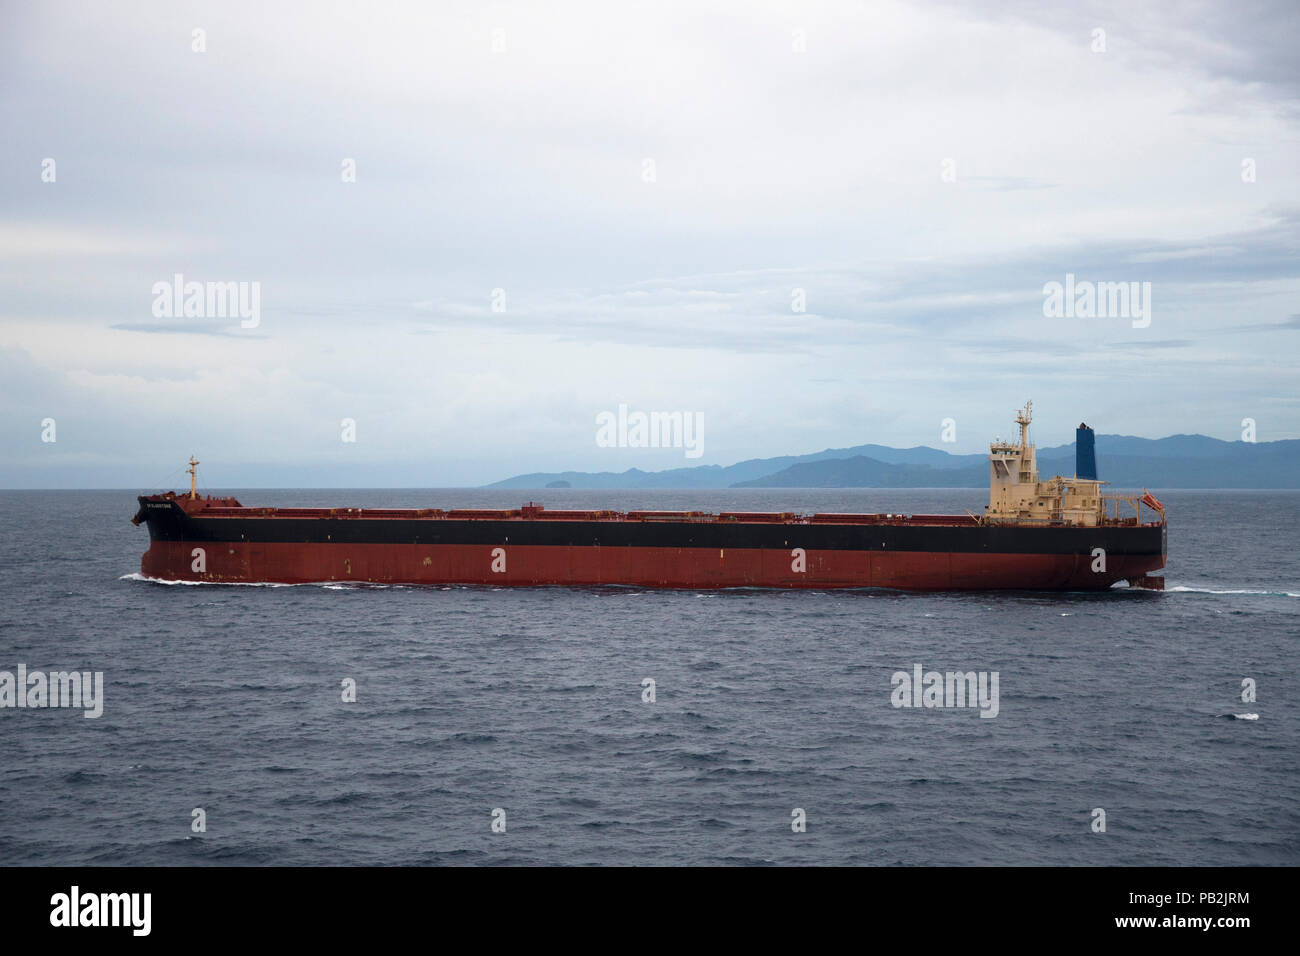 Ships - Stock Image